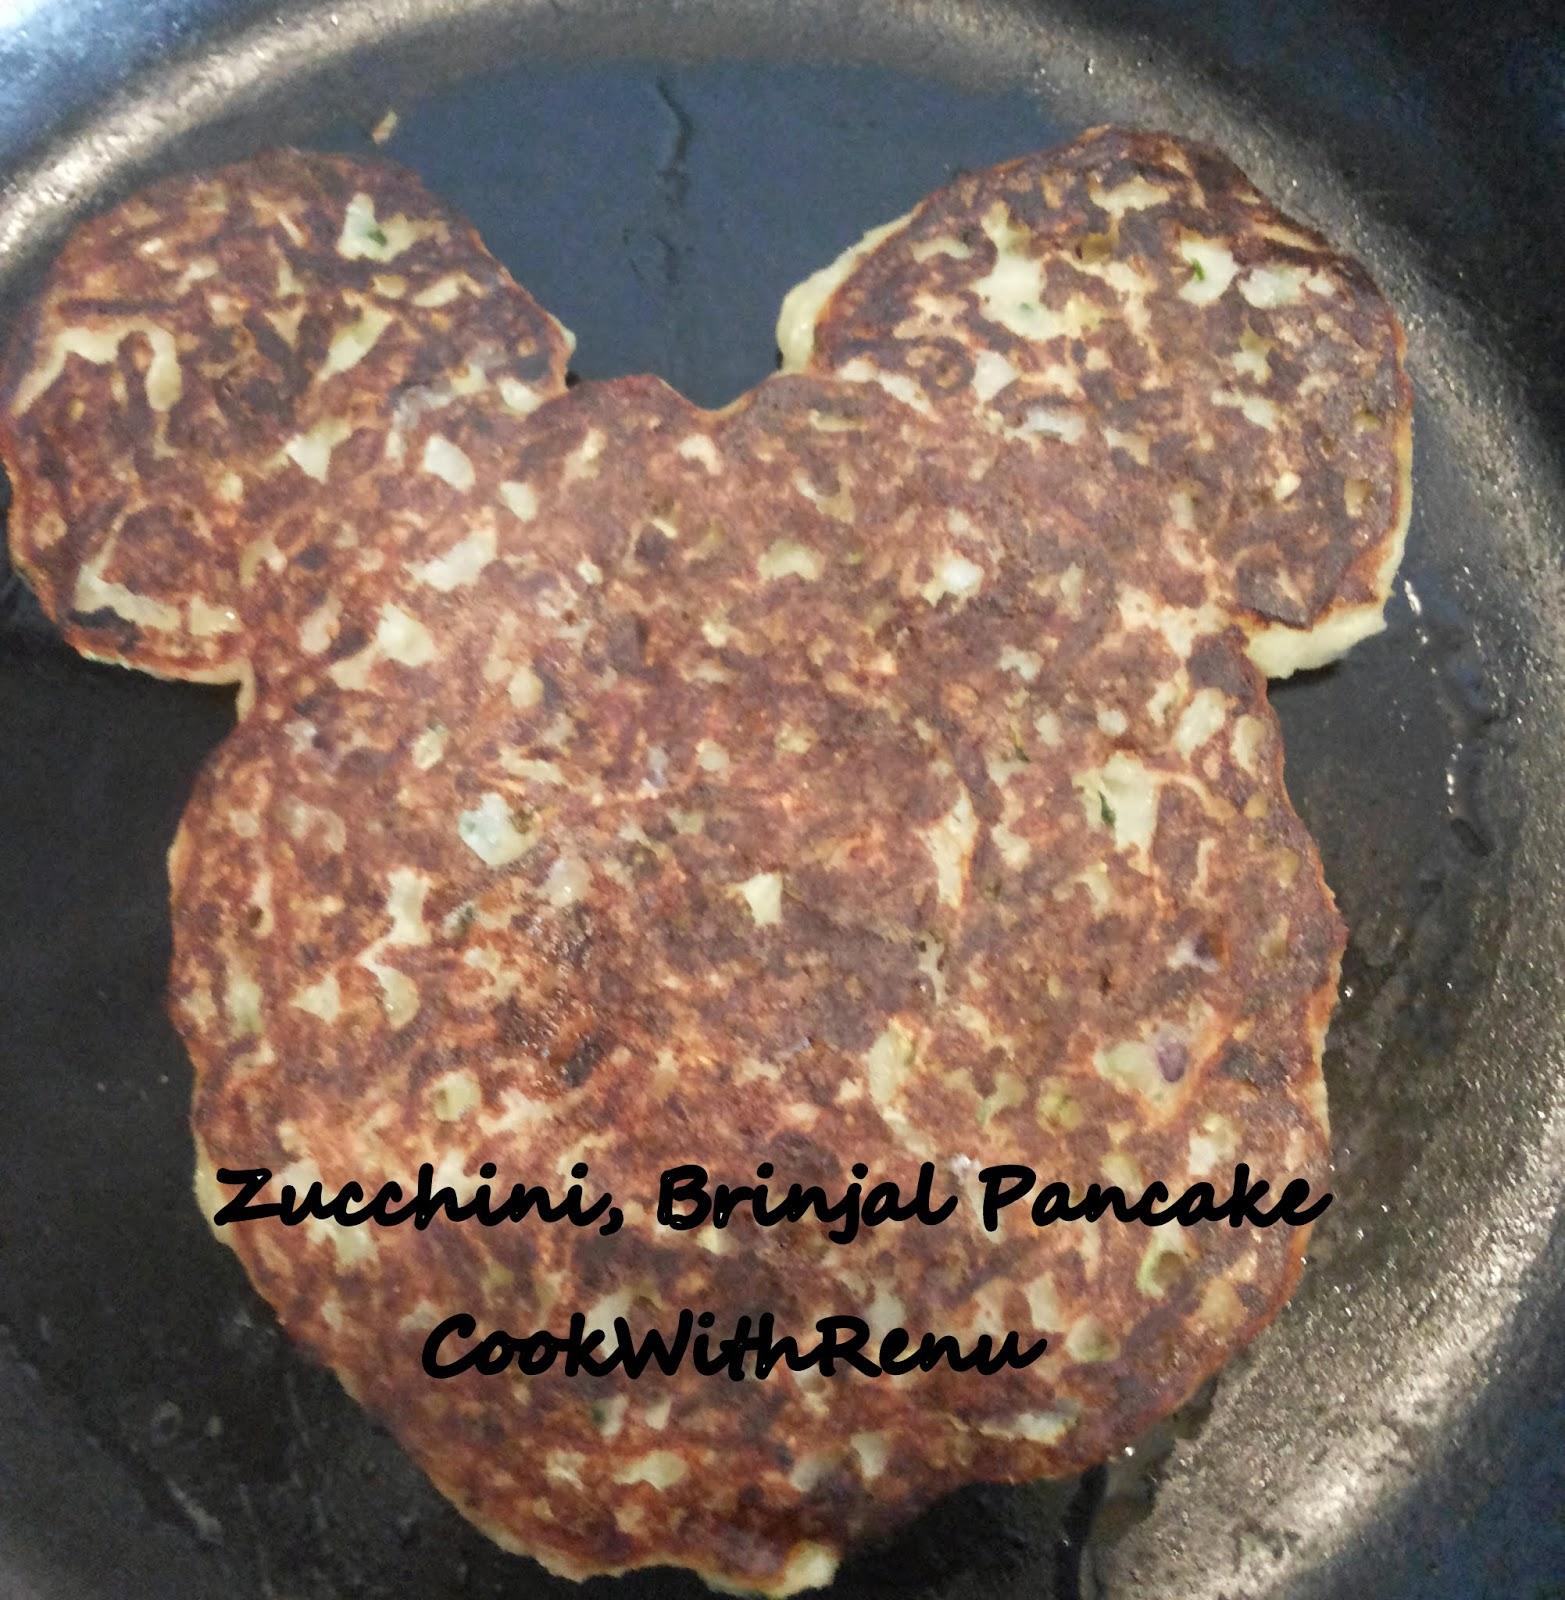 Zucchini, Brinjal Pancake